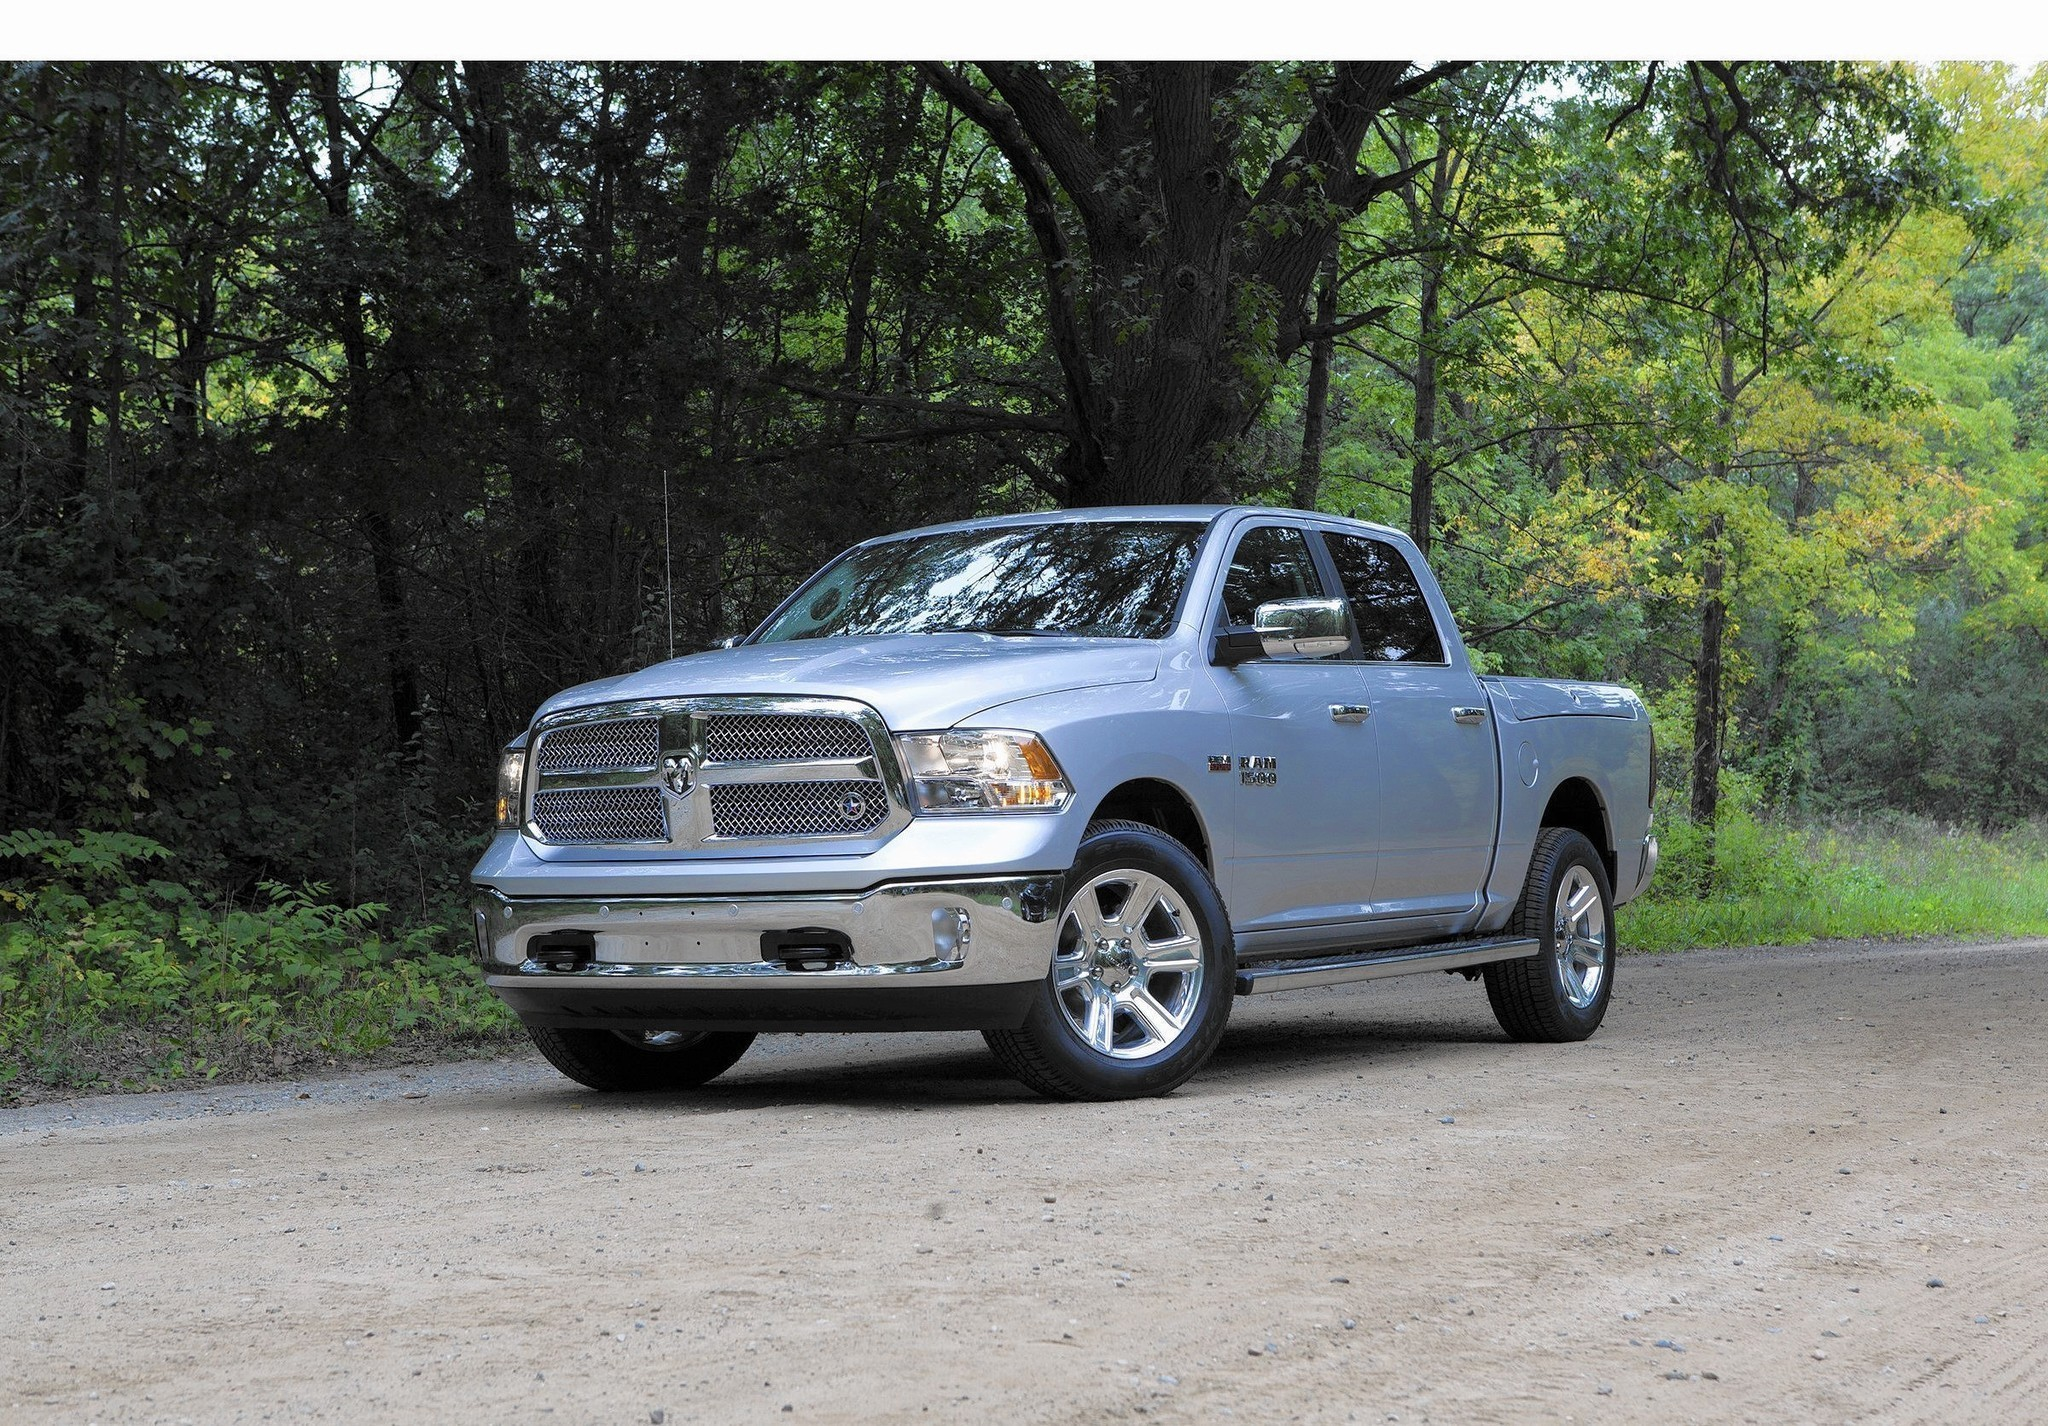 Ford Truck Incentives Pickup Truck Incentives Reach Recession Era High Chicago Tribune